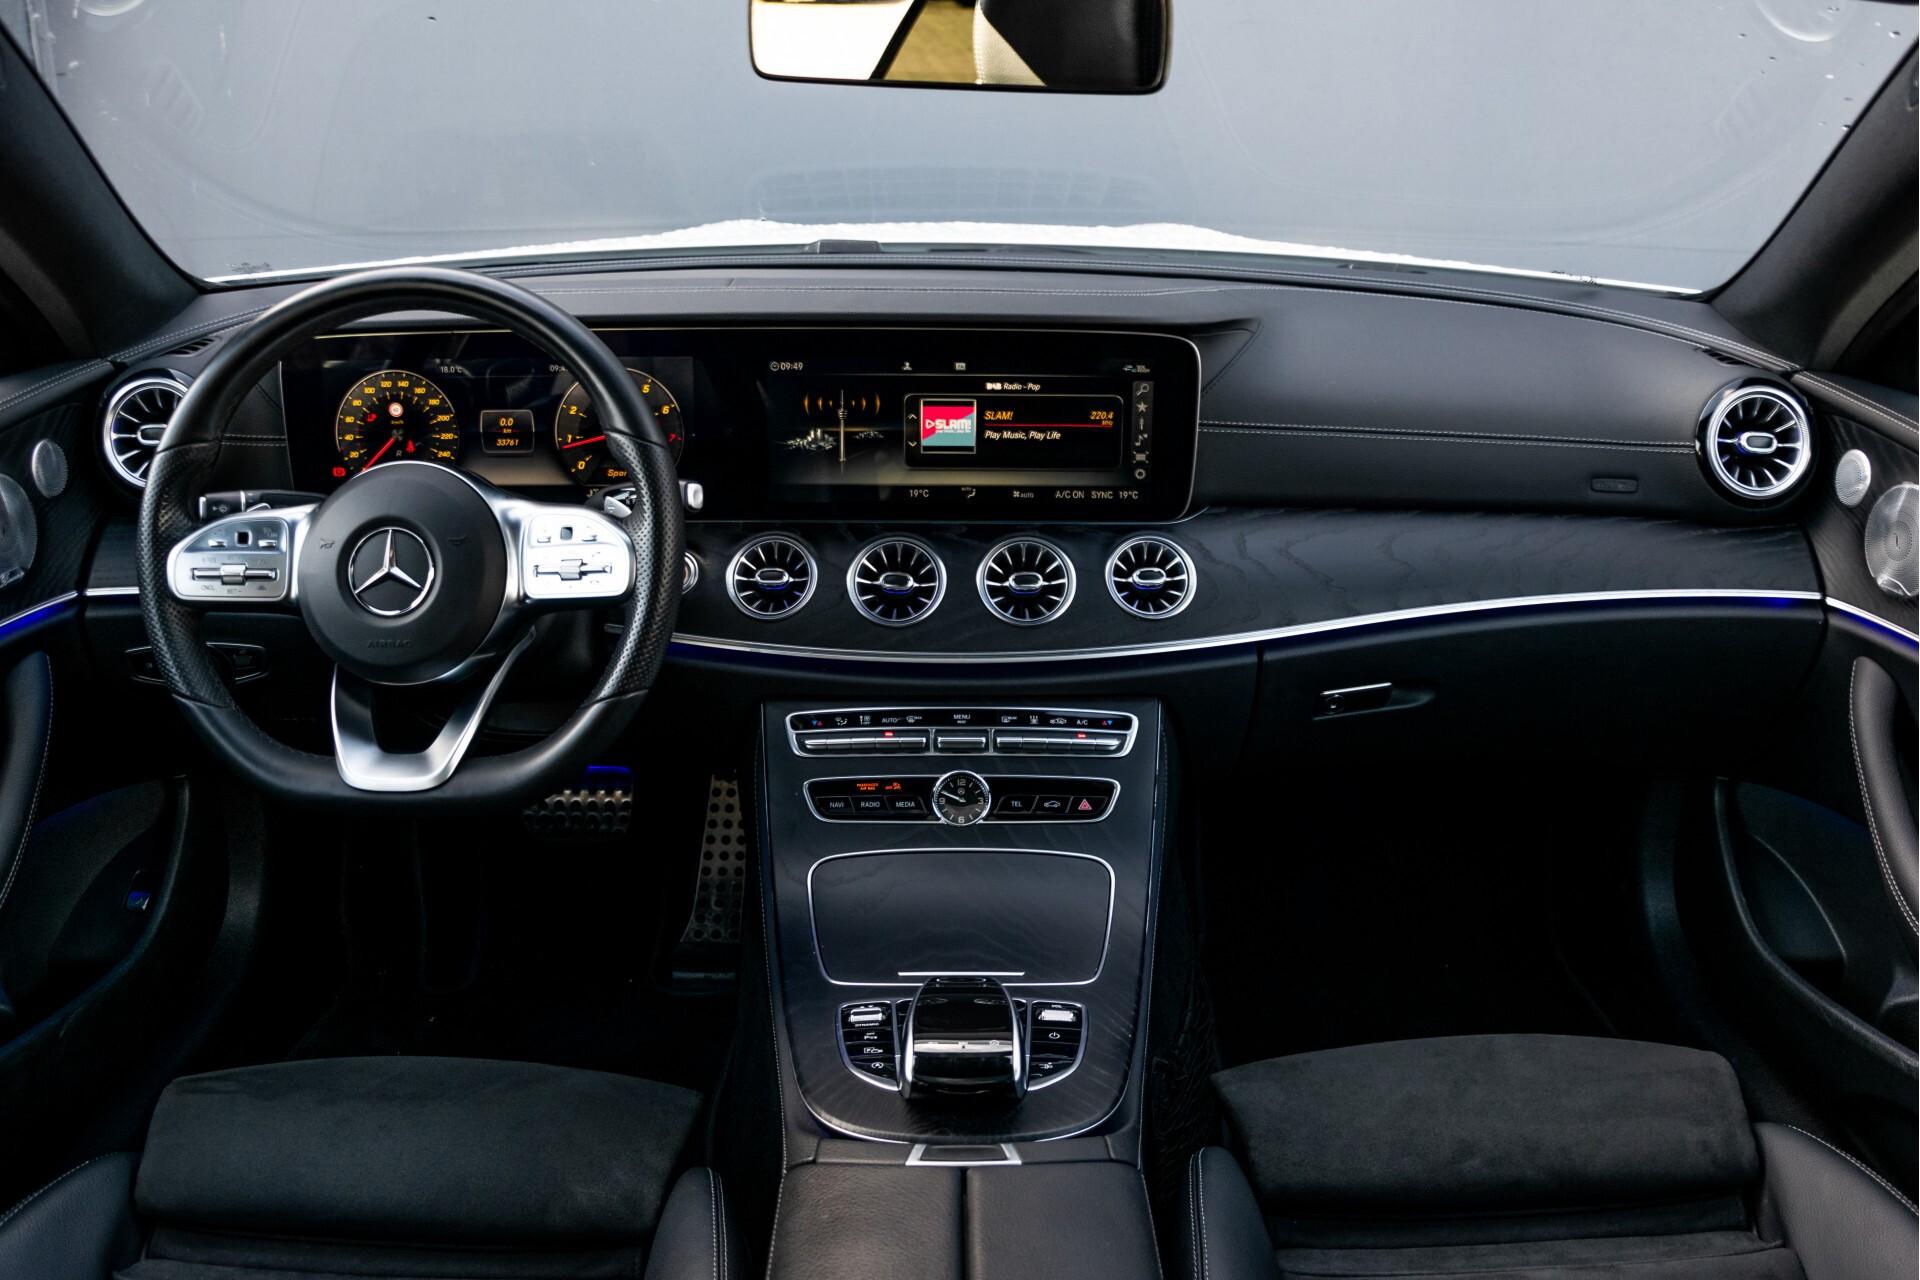 Mercedes-Benz E-Klasse Coupé 300 AMG Panorama/Rij-assist/Keyless/Massage/Memory/HUD/Standkachel/Night Aut9 Foto 6